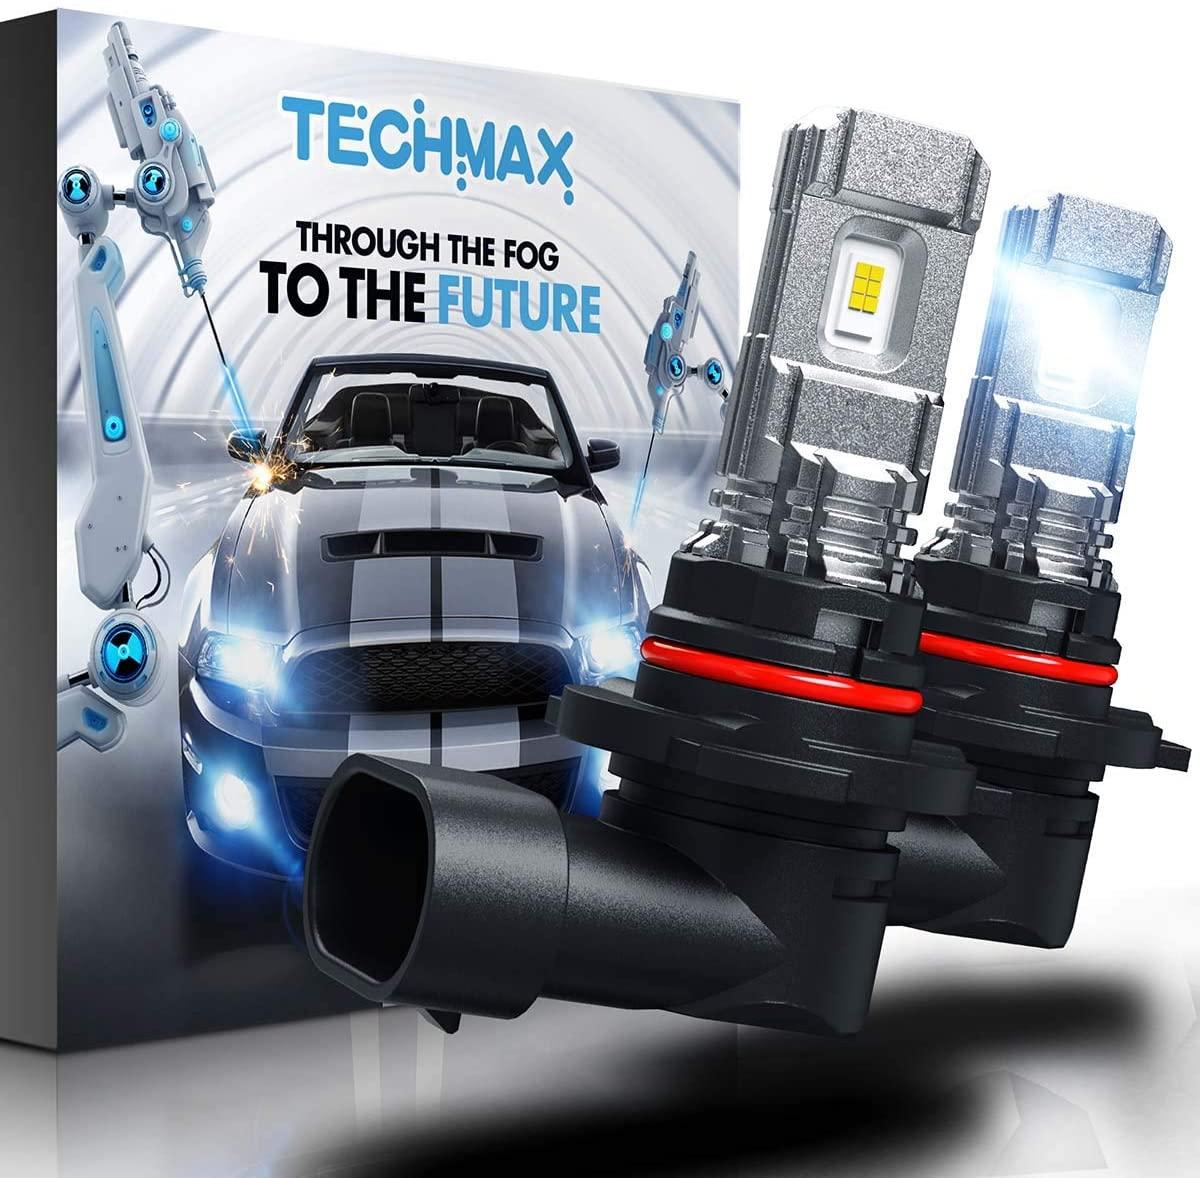 TECHMAX H10 LED Fog Light Bulbs,9145 9140 DRL 6000K Xenon White 2800LM 60W 320°Beam Angle Pack of 2